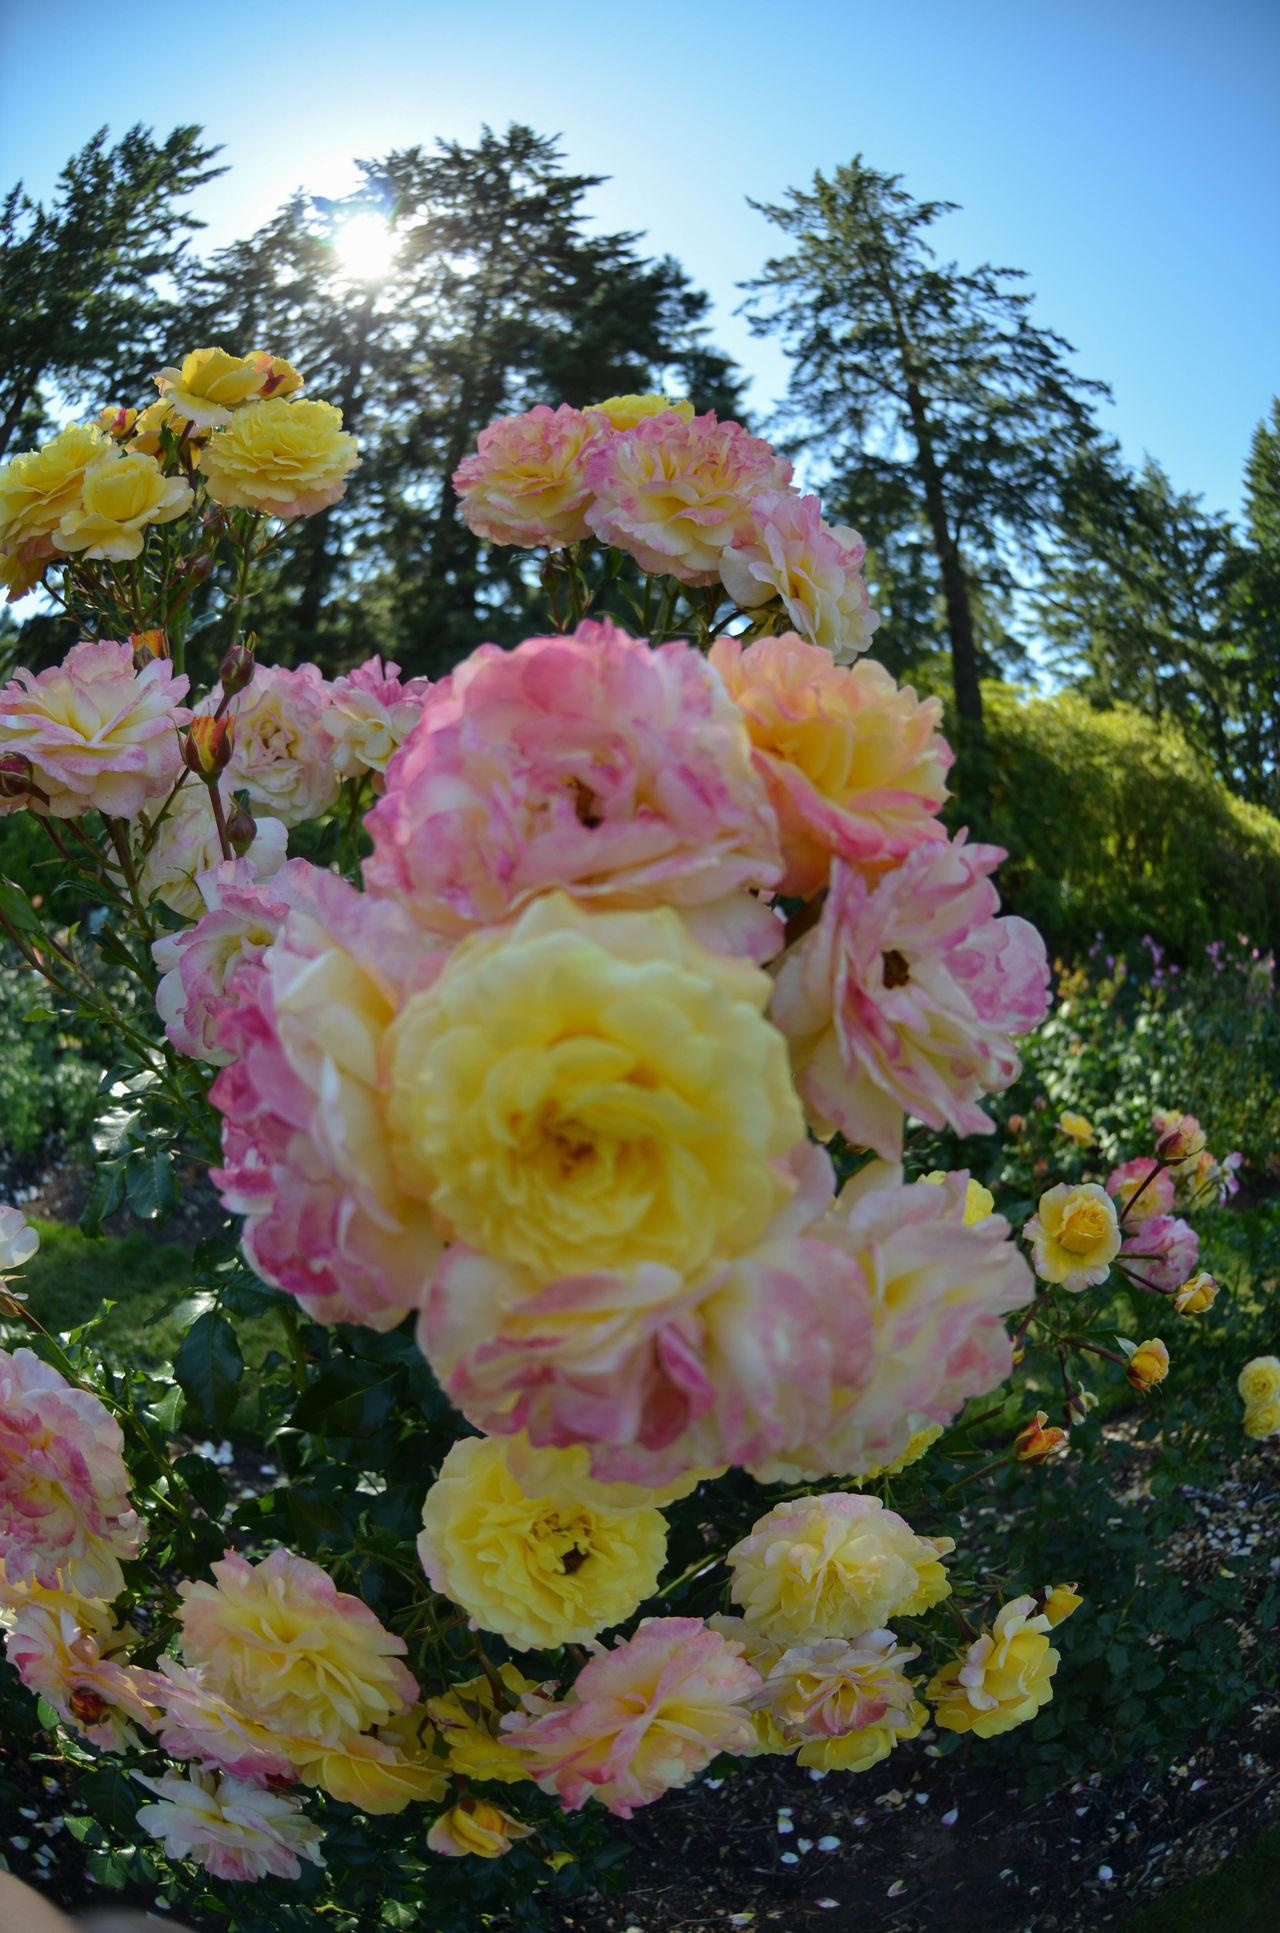 Rose city perfection 🌹Portlandrosegarden PNWonderland PNW Nikon Nikon D5100  Nikonphotography Roses🌹 Themaneimagephotography Oregonsummer Fisheyelens